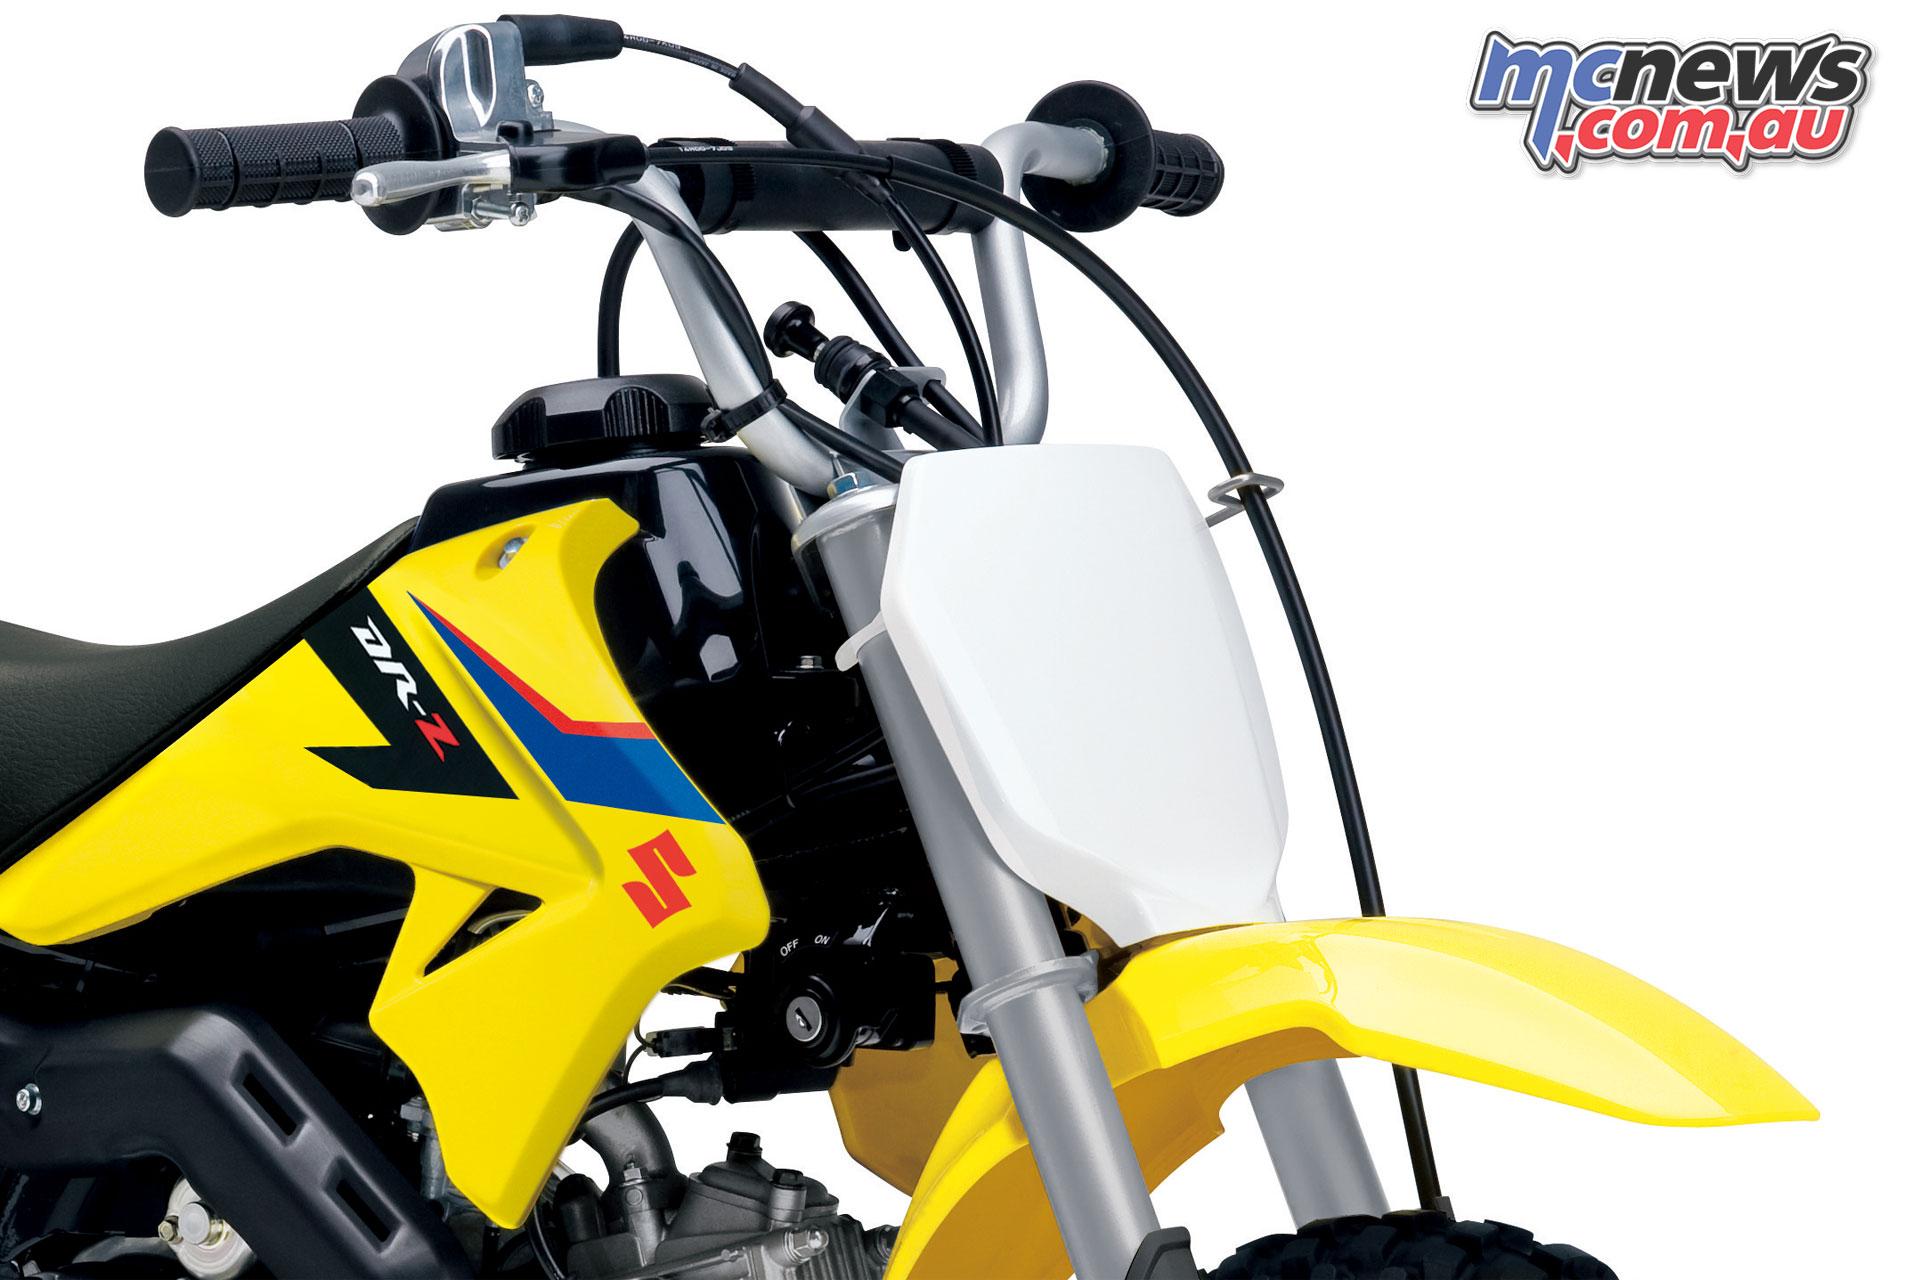 New Suzuki Dr Z50 Junior Dirt Bike 2390 Mcnews Com Au